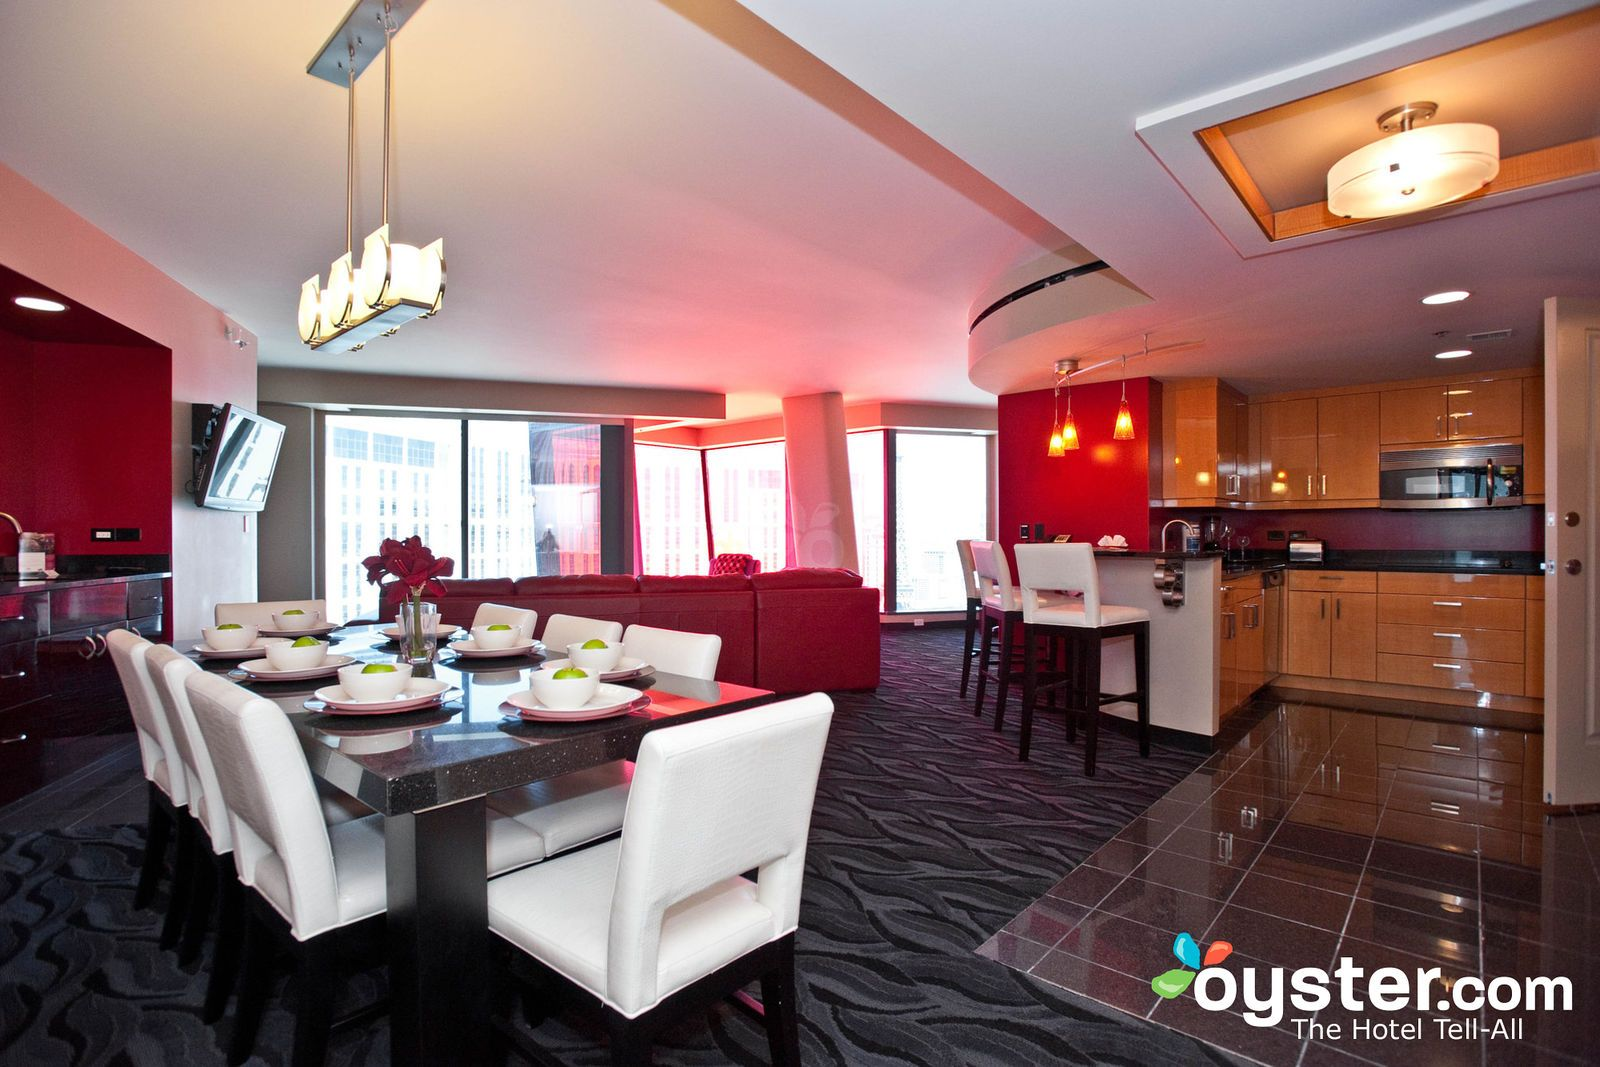 Suite Bellagio Las Vegas Bedroom Suites Hotels With Amp Casino Westgate  Resort